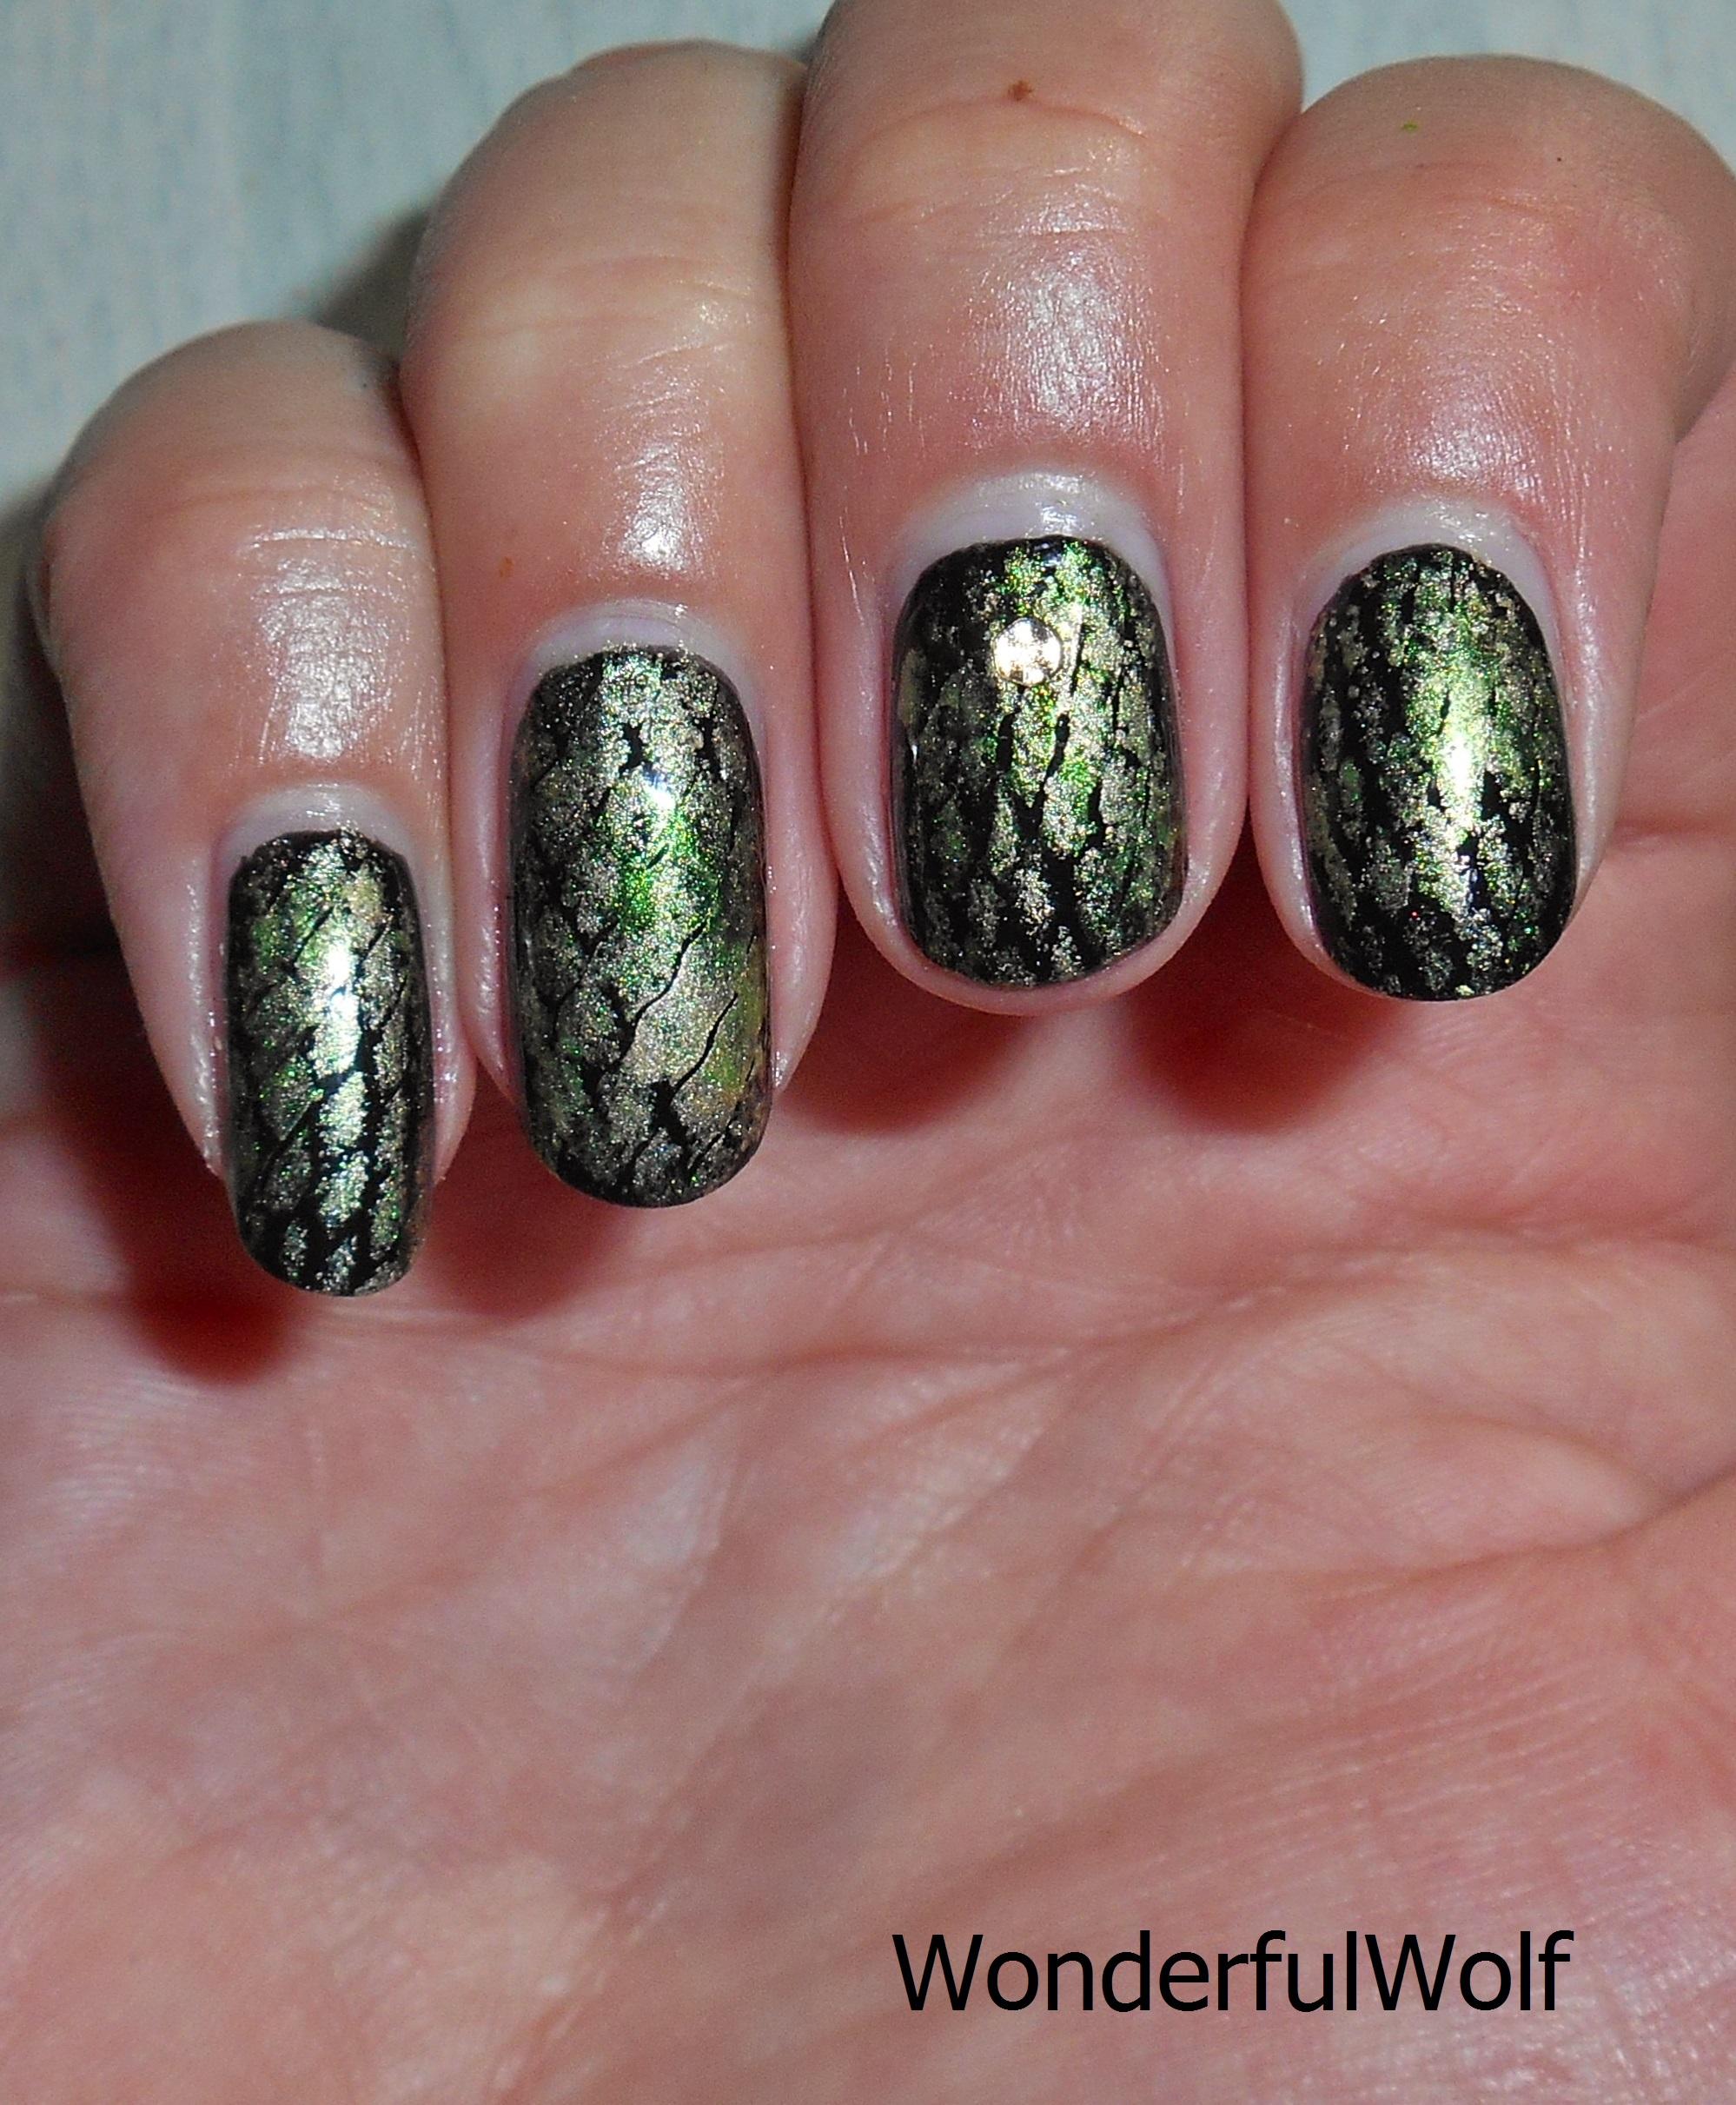 Snake Nail Art Wonderfulwolf